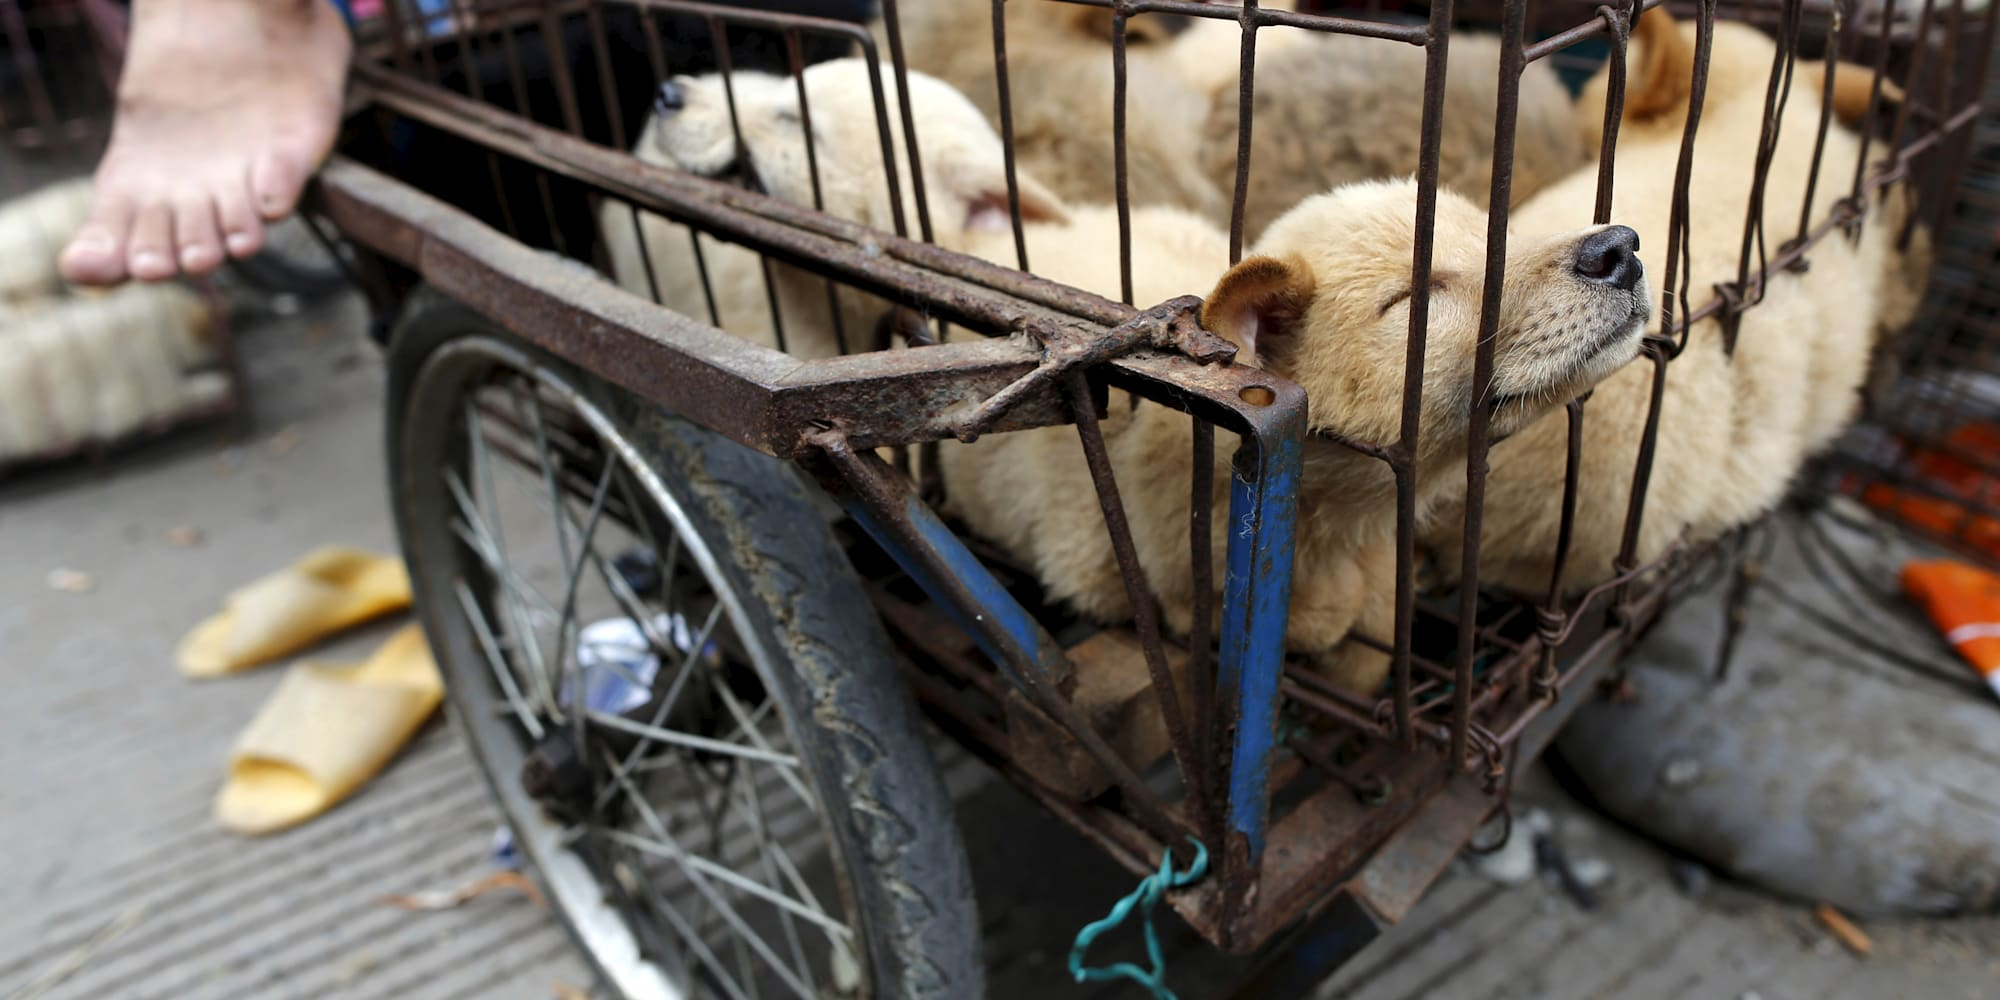 Risultati immagini per taiwan vieta l'uccisione di cani e gatti per l'alimentazione umana